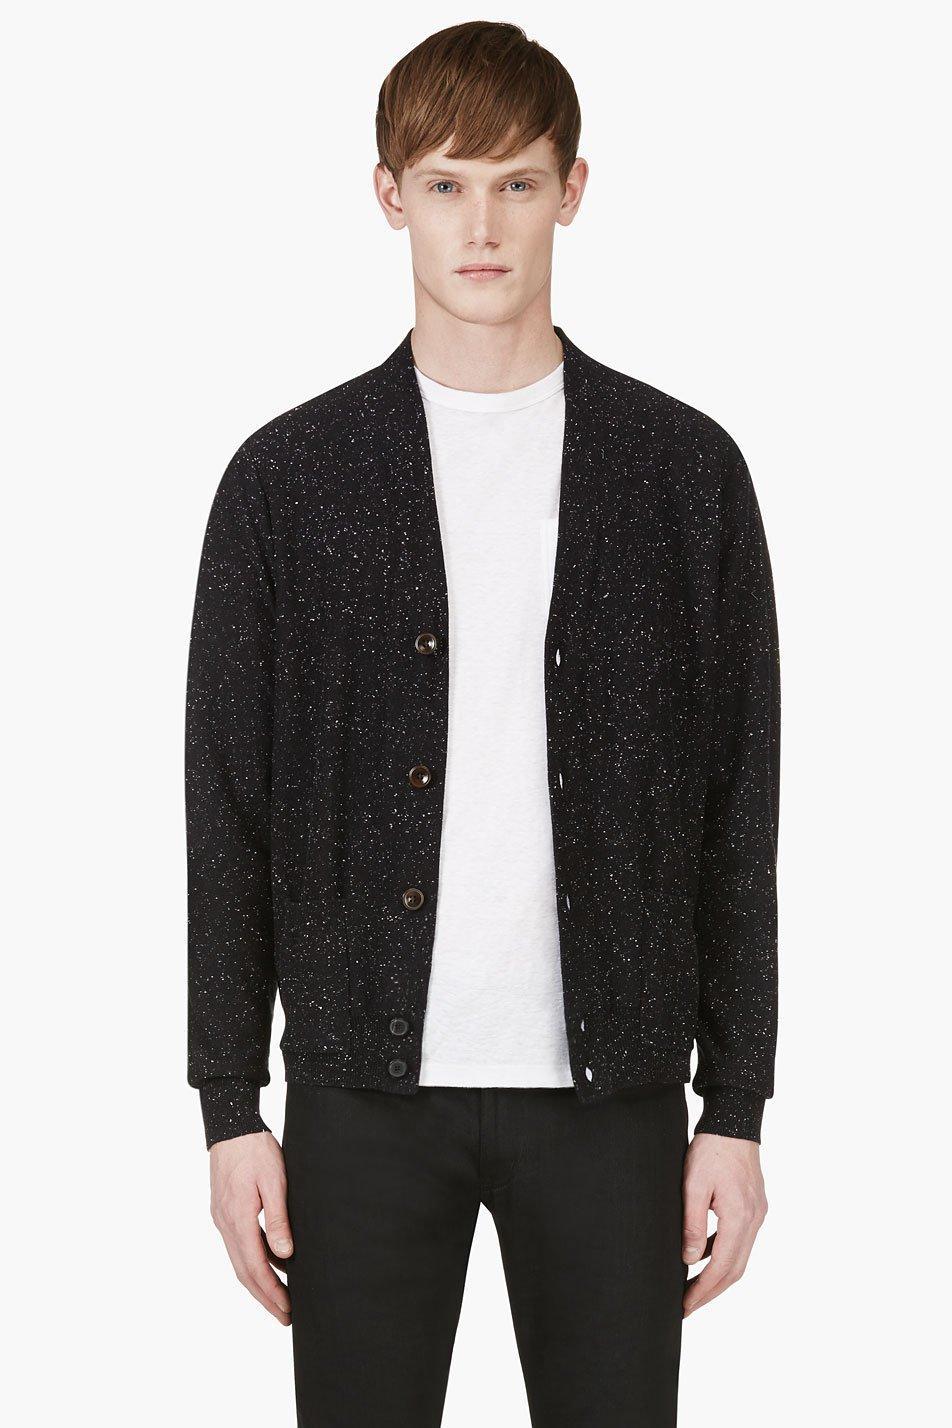 paul smith jeans black slub elbow patch cardigan